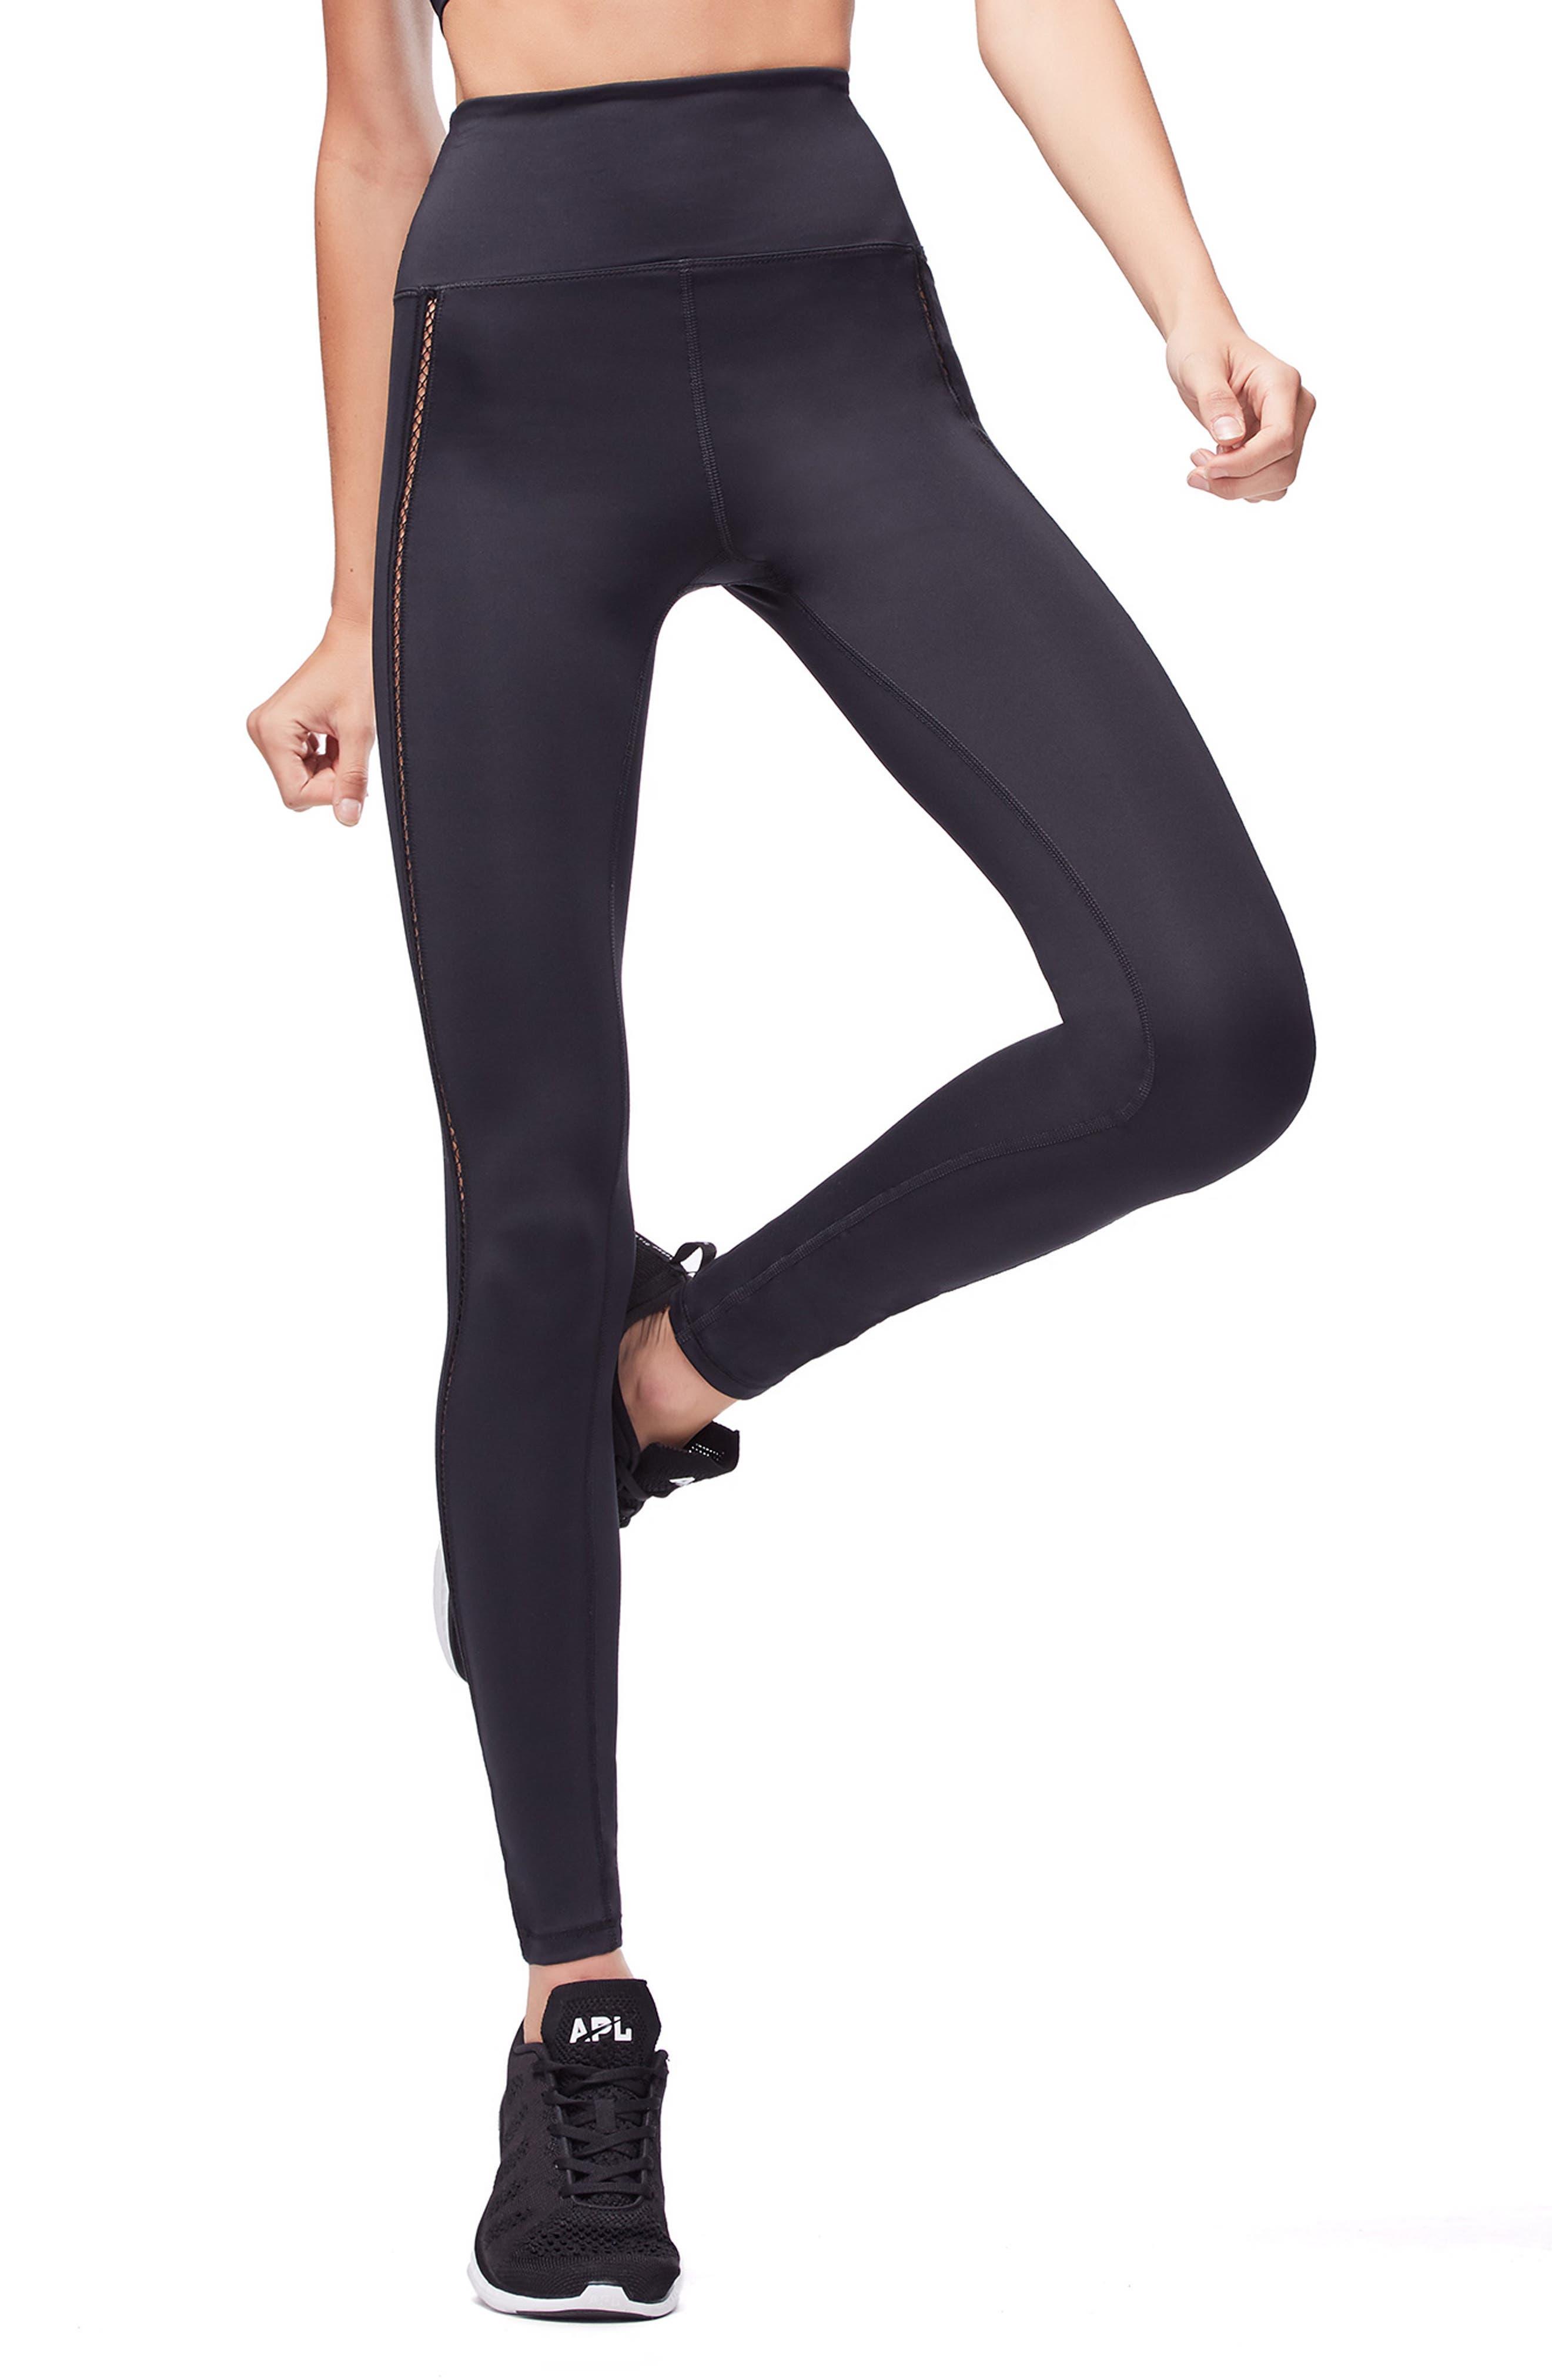 Mixed Mesh High Waist Leggings,                         Main,                         color, BLACK001